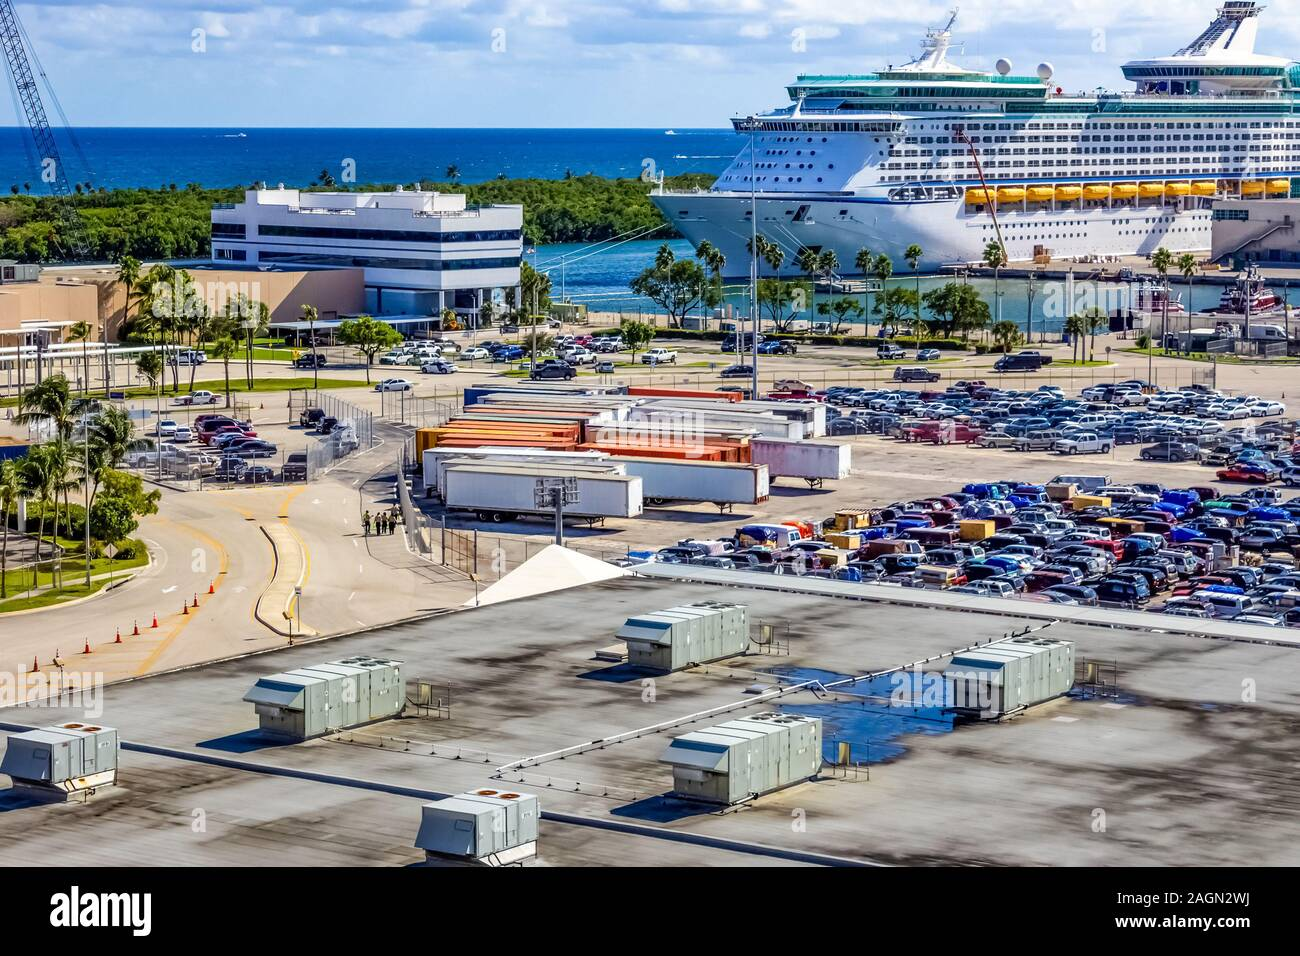 Casino games carnival cruise ships